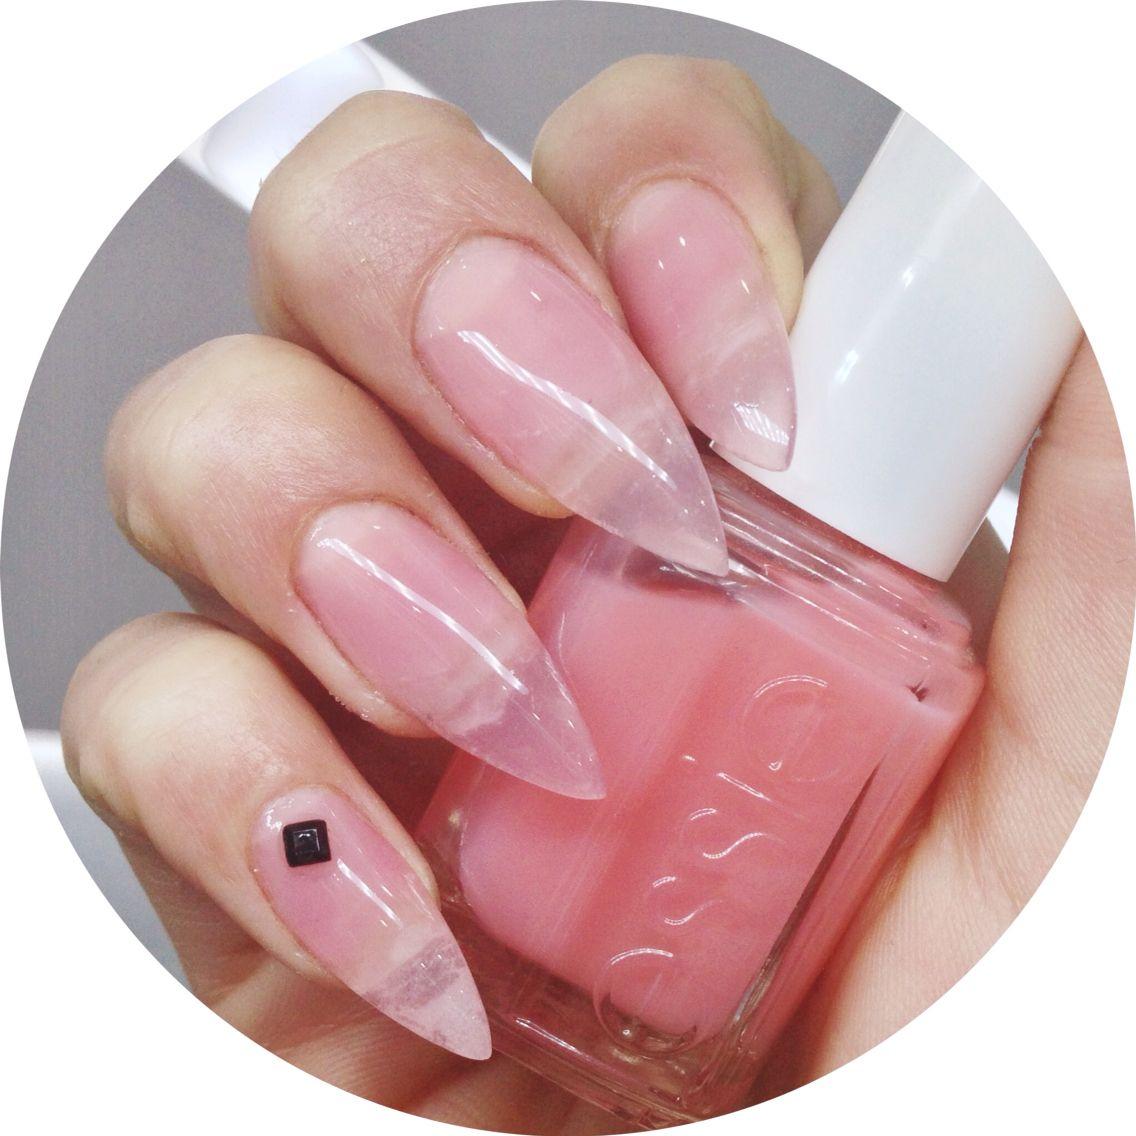 Essie Nail Polish 545 Pink Glove Service 0.46oz